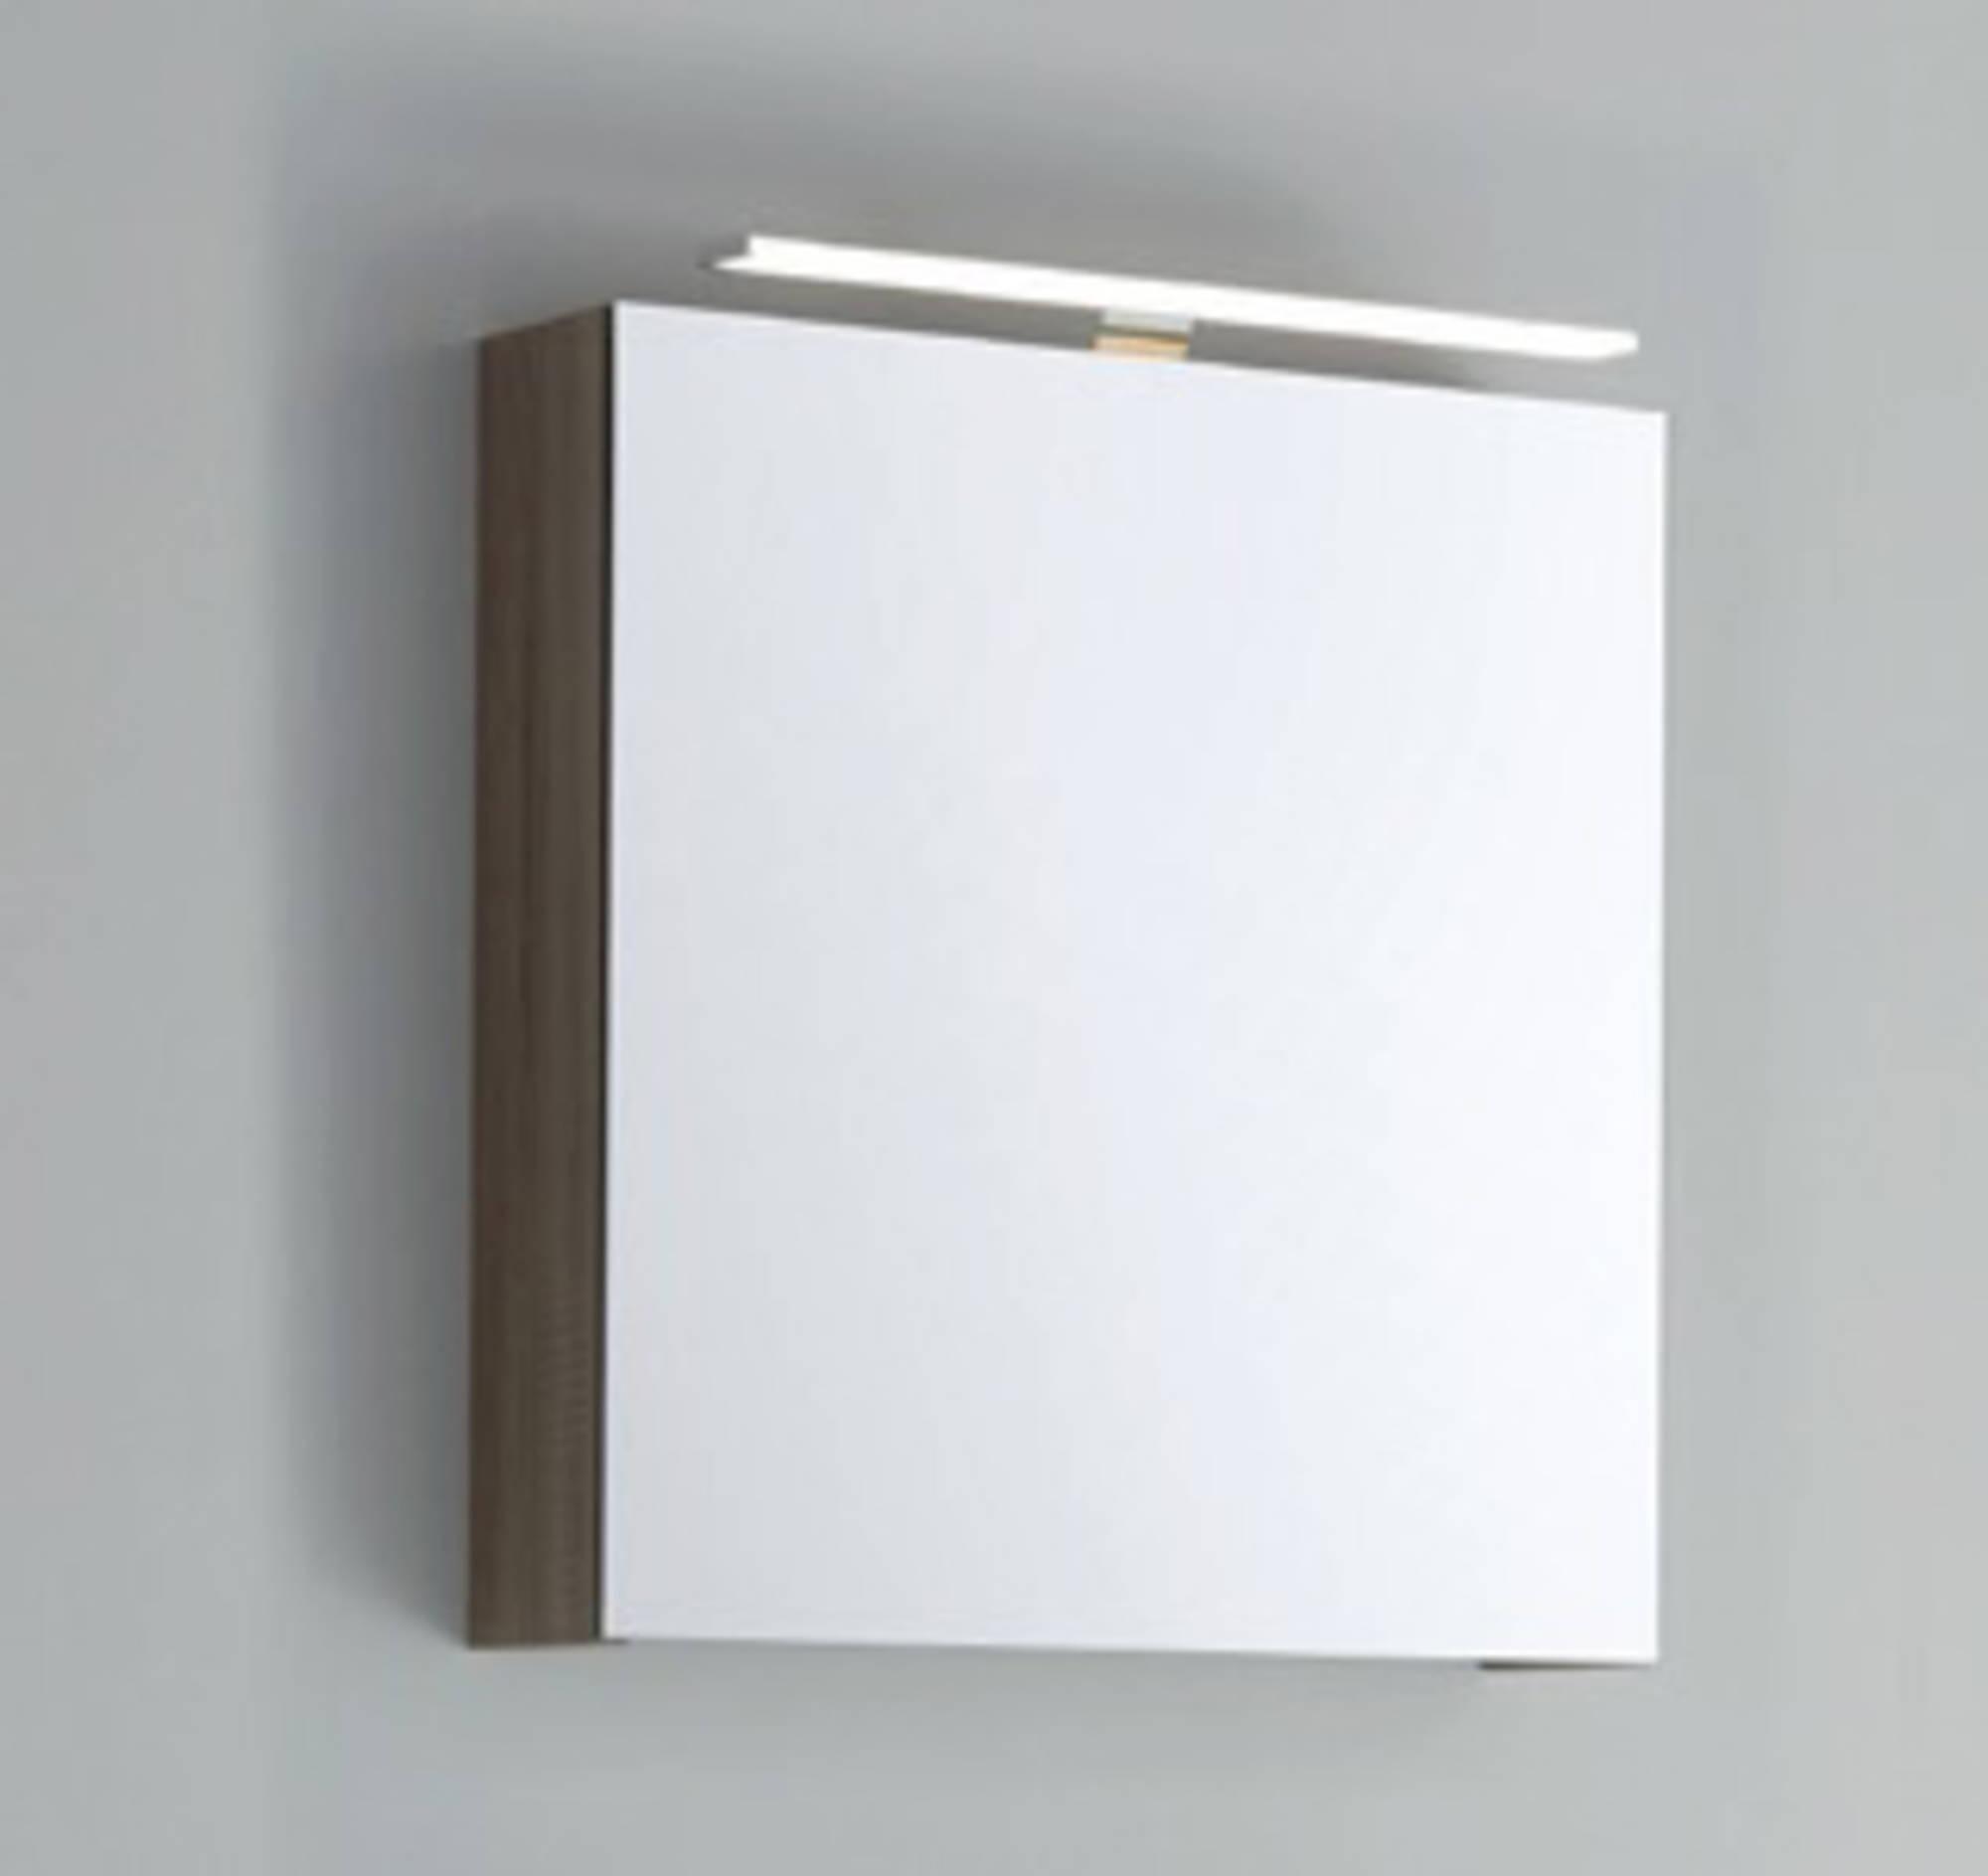 Line 45 Spiegelkast Linksdraaiend 60x13,5x60 cm excl. Verlichting Navarro Eiken